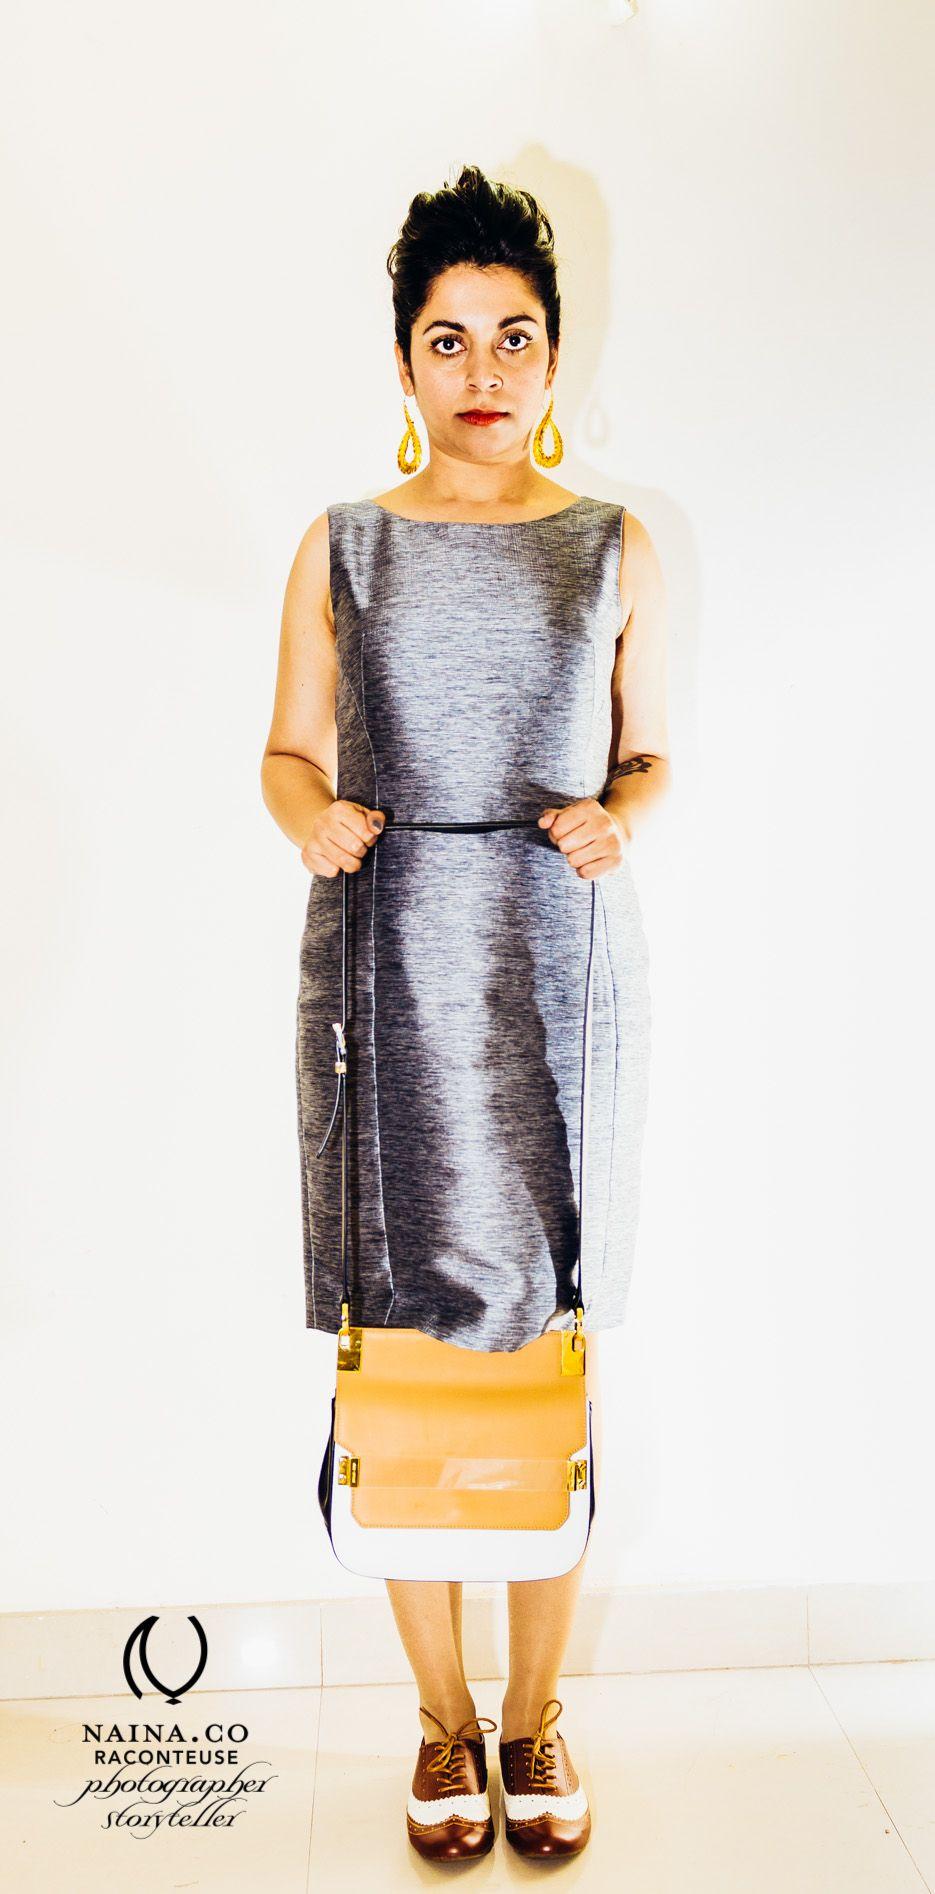 16 CoverUp http://www.naina.co/photography/2014/05/16-coverup/ #MichaelKors #HobbsUK #British #ALDOShoes #Silk #AmrapaliJewels #NainaCo